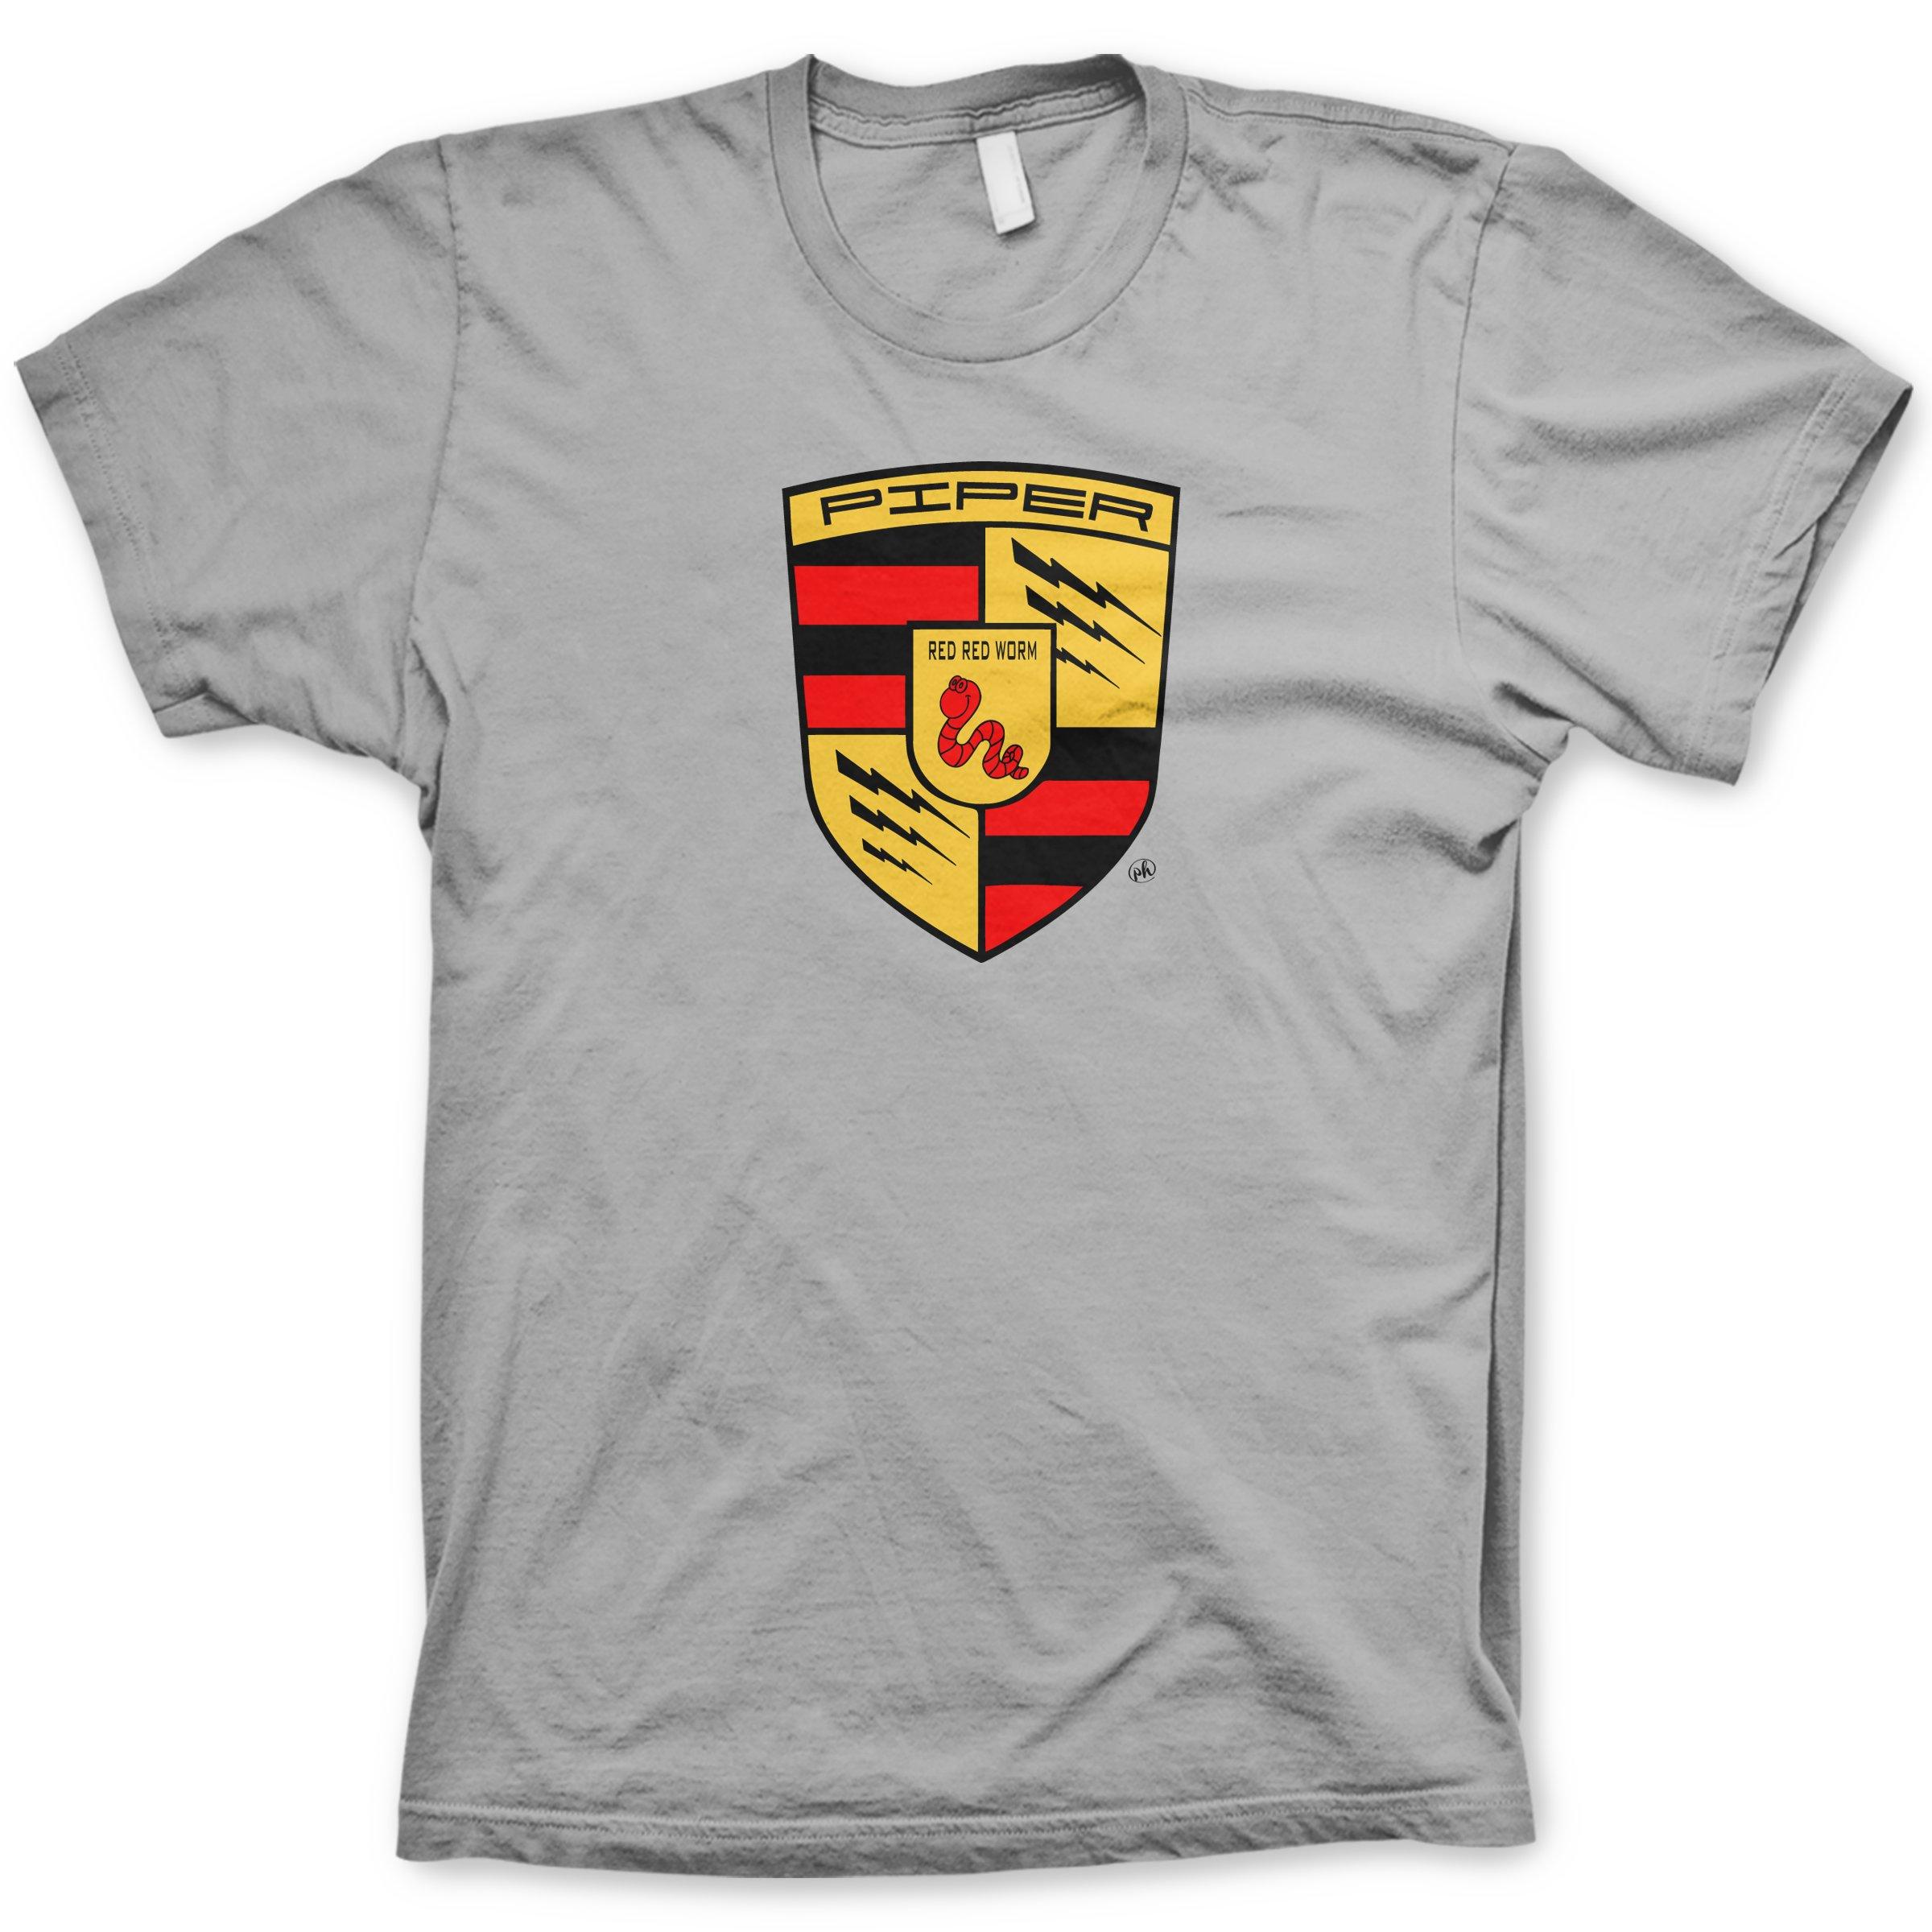 3cde2a672 Phish Piper T-Shirt